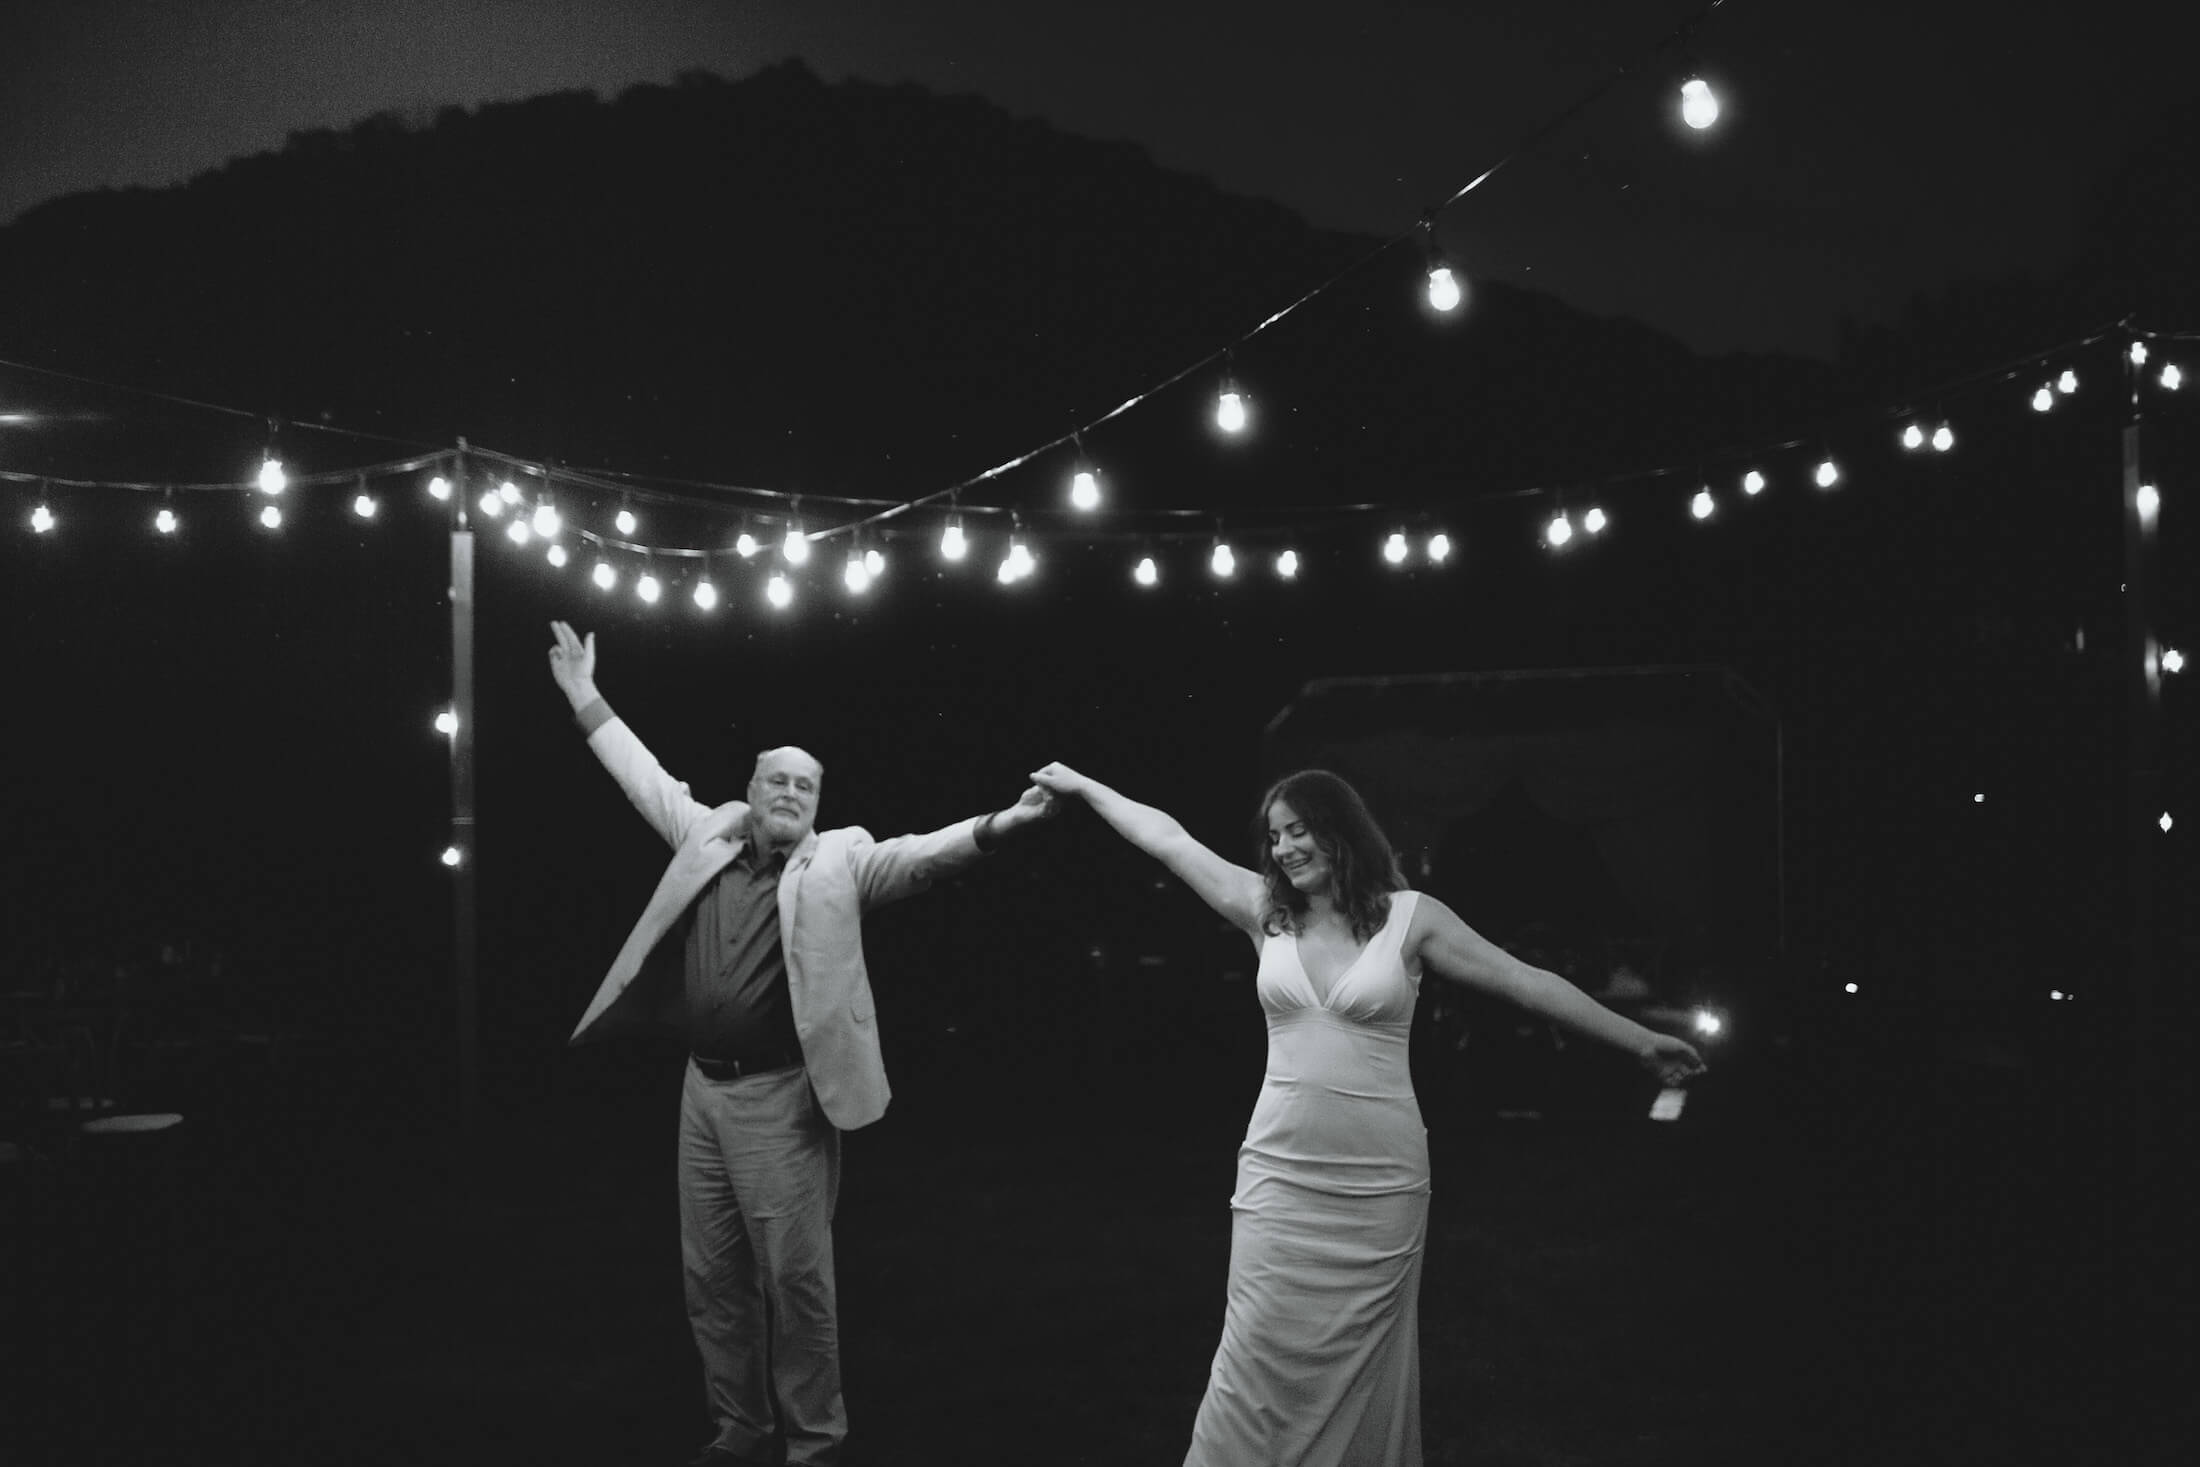 engle-olson-ray-kelly-photography-wisconsin-wedding-143.jpg